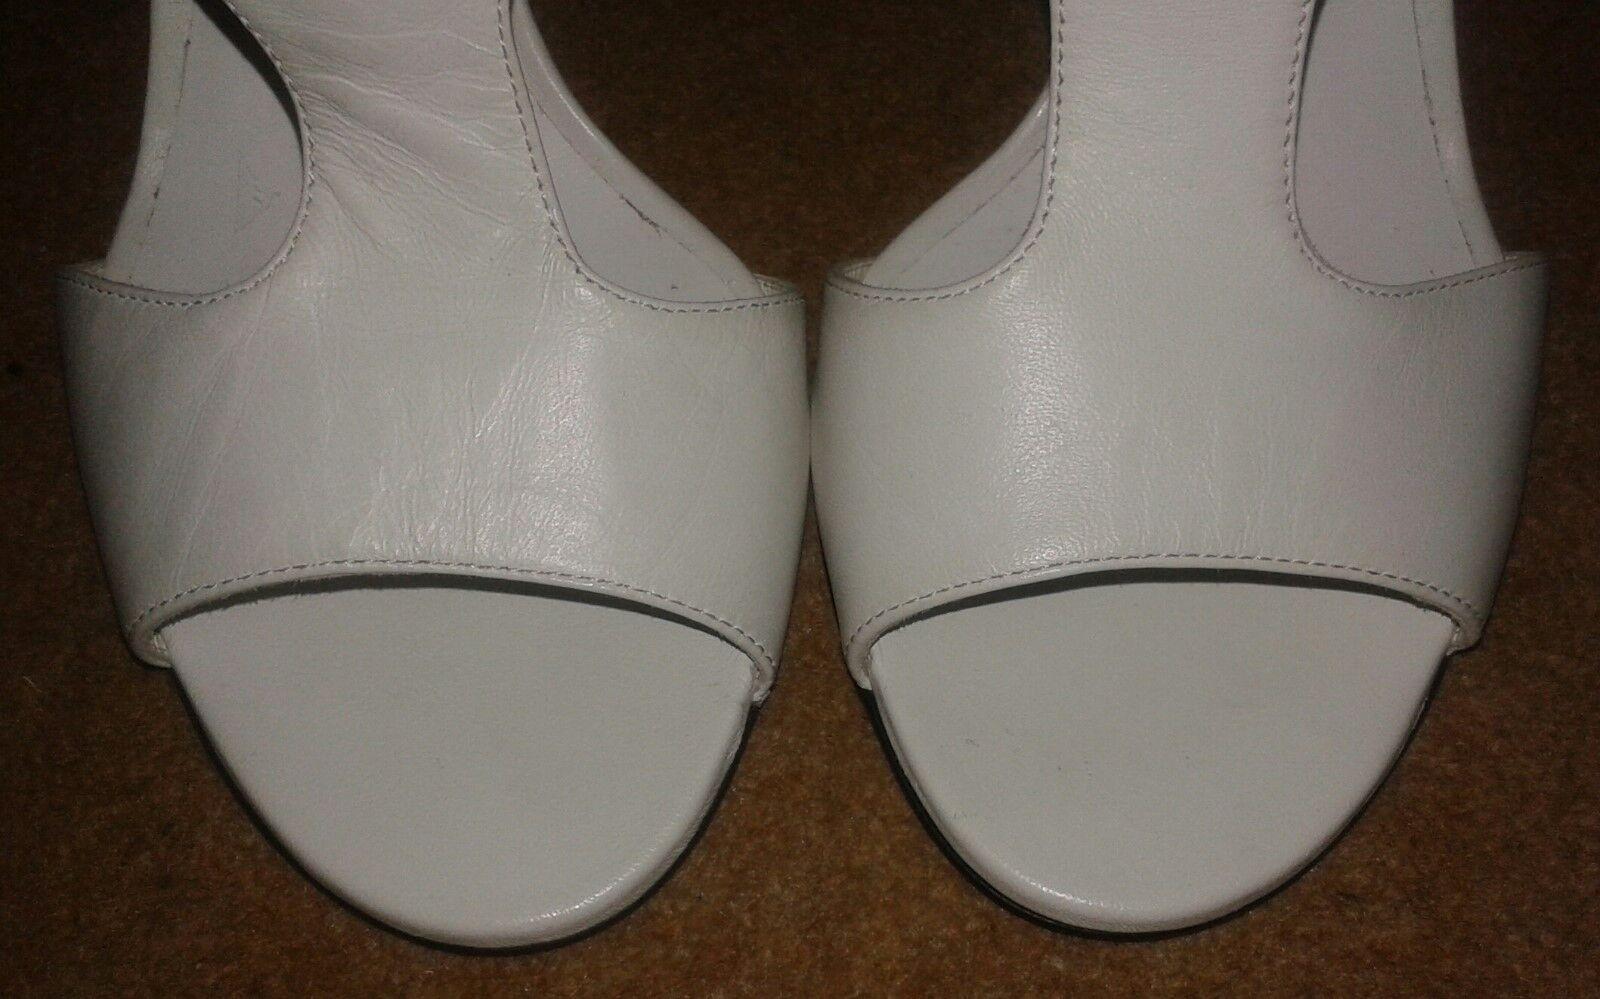 Tamara Mellon Laser Cut Out Back Zip Leather Sandals Cream Cream Cream -UK 6  EU 38  9f687f